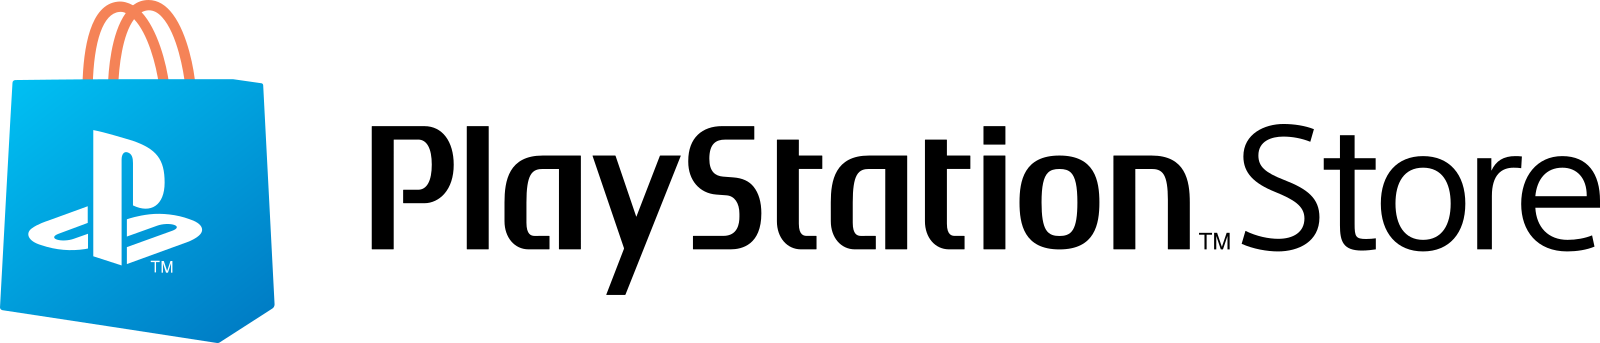 playstation store logo 4 - PlayStation Store Logo